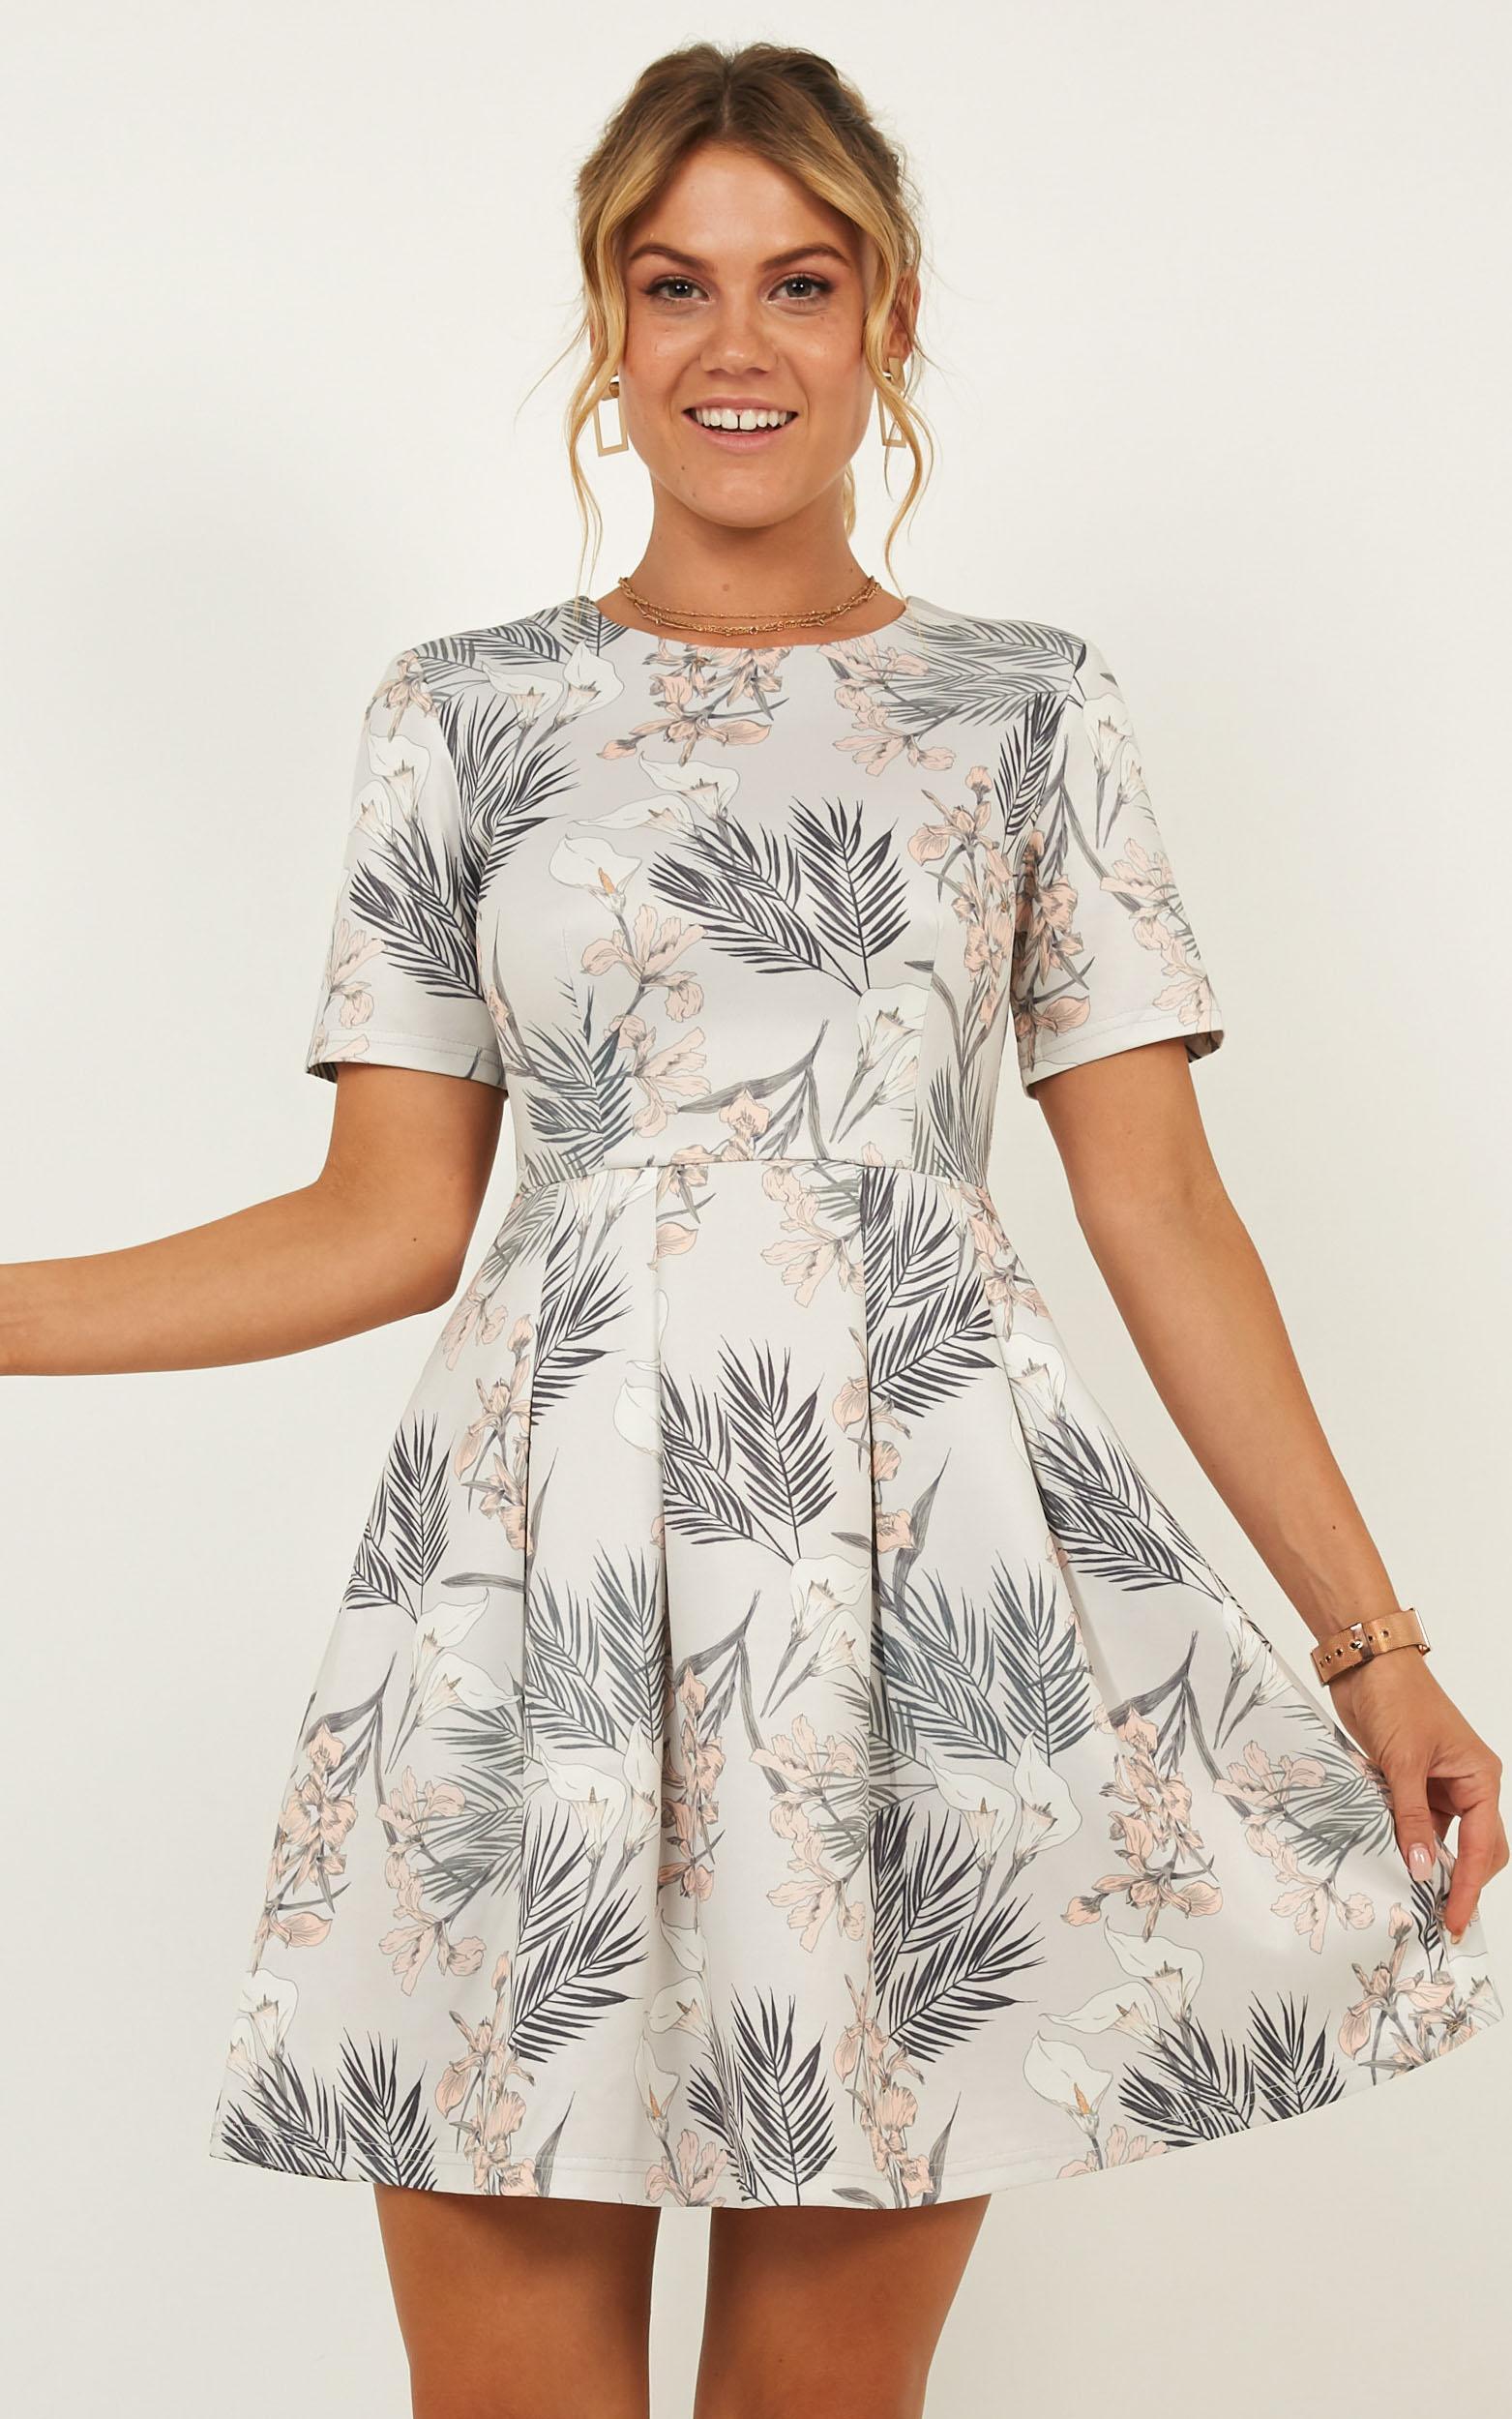 Meet the Parents Dress in Grey Floral - 20 (XXXXL), Beige, hi-res image number null